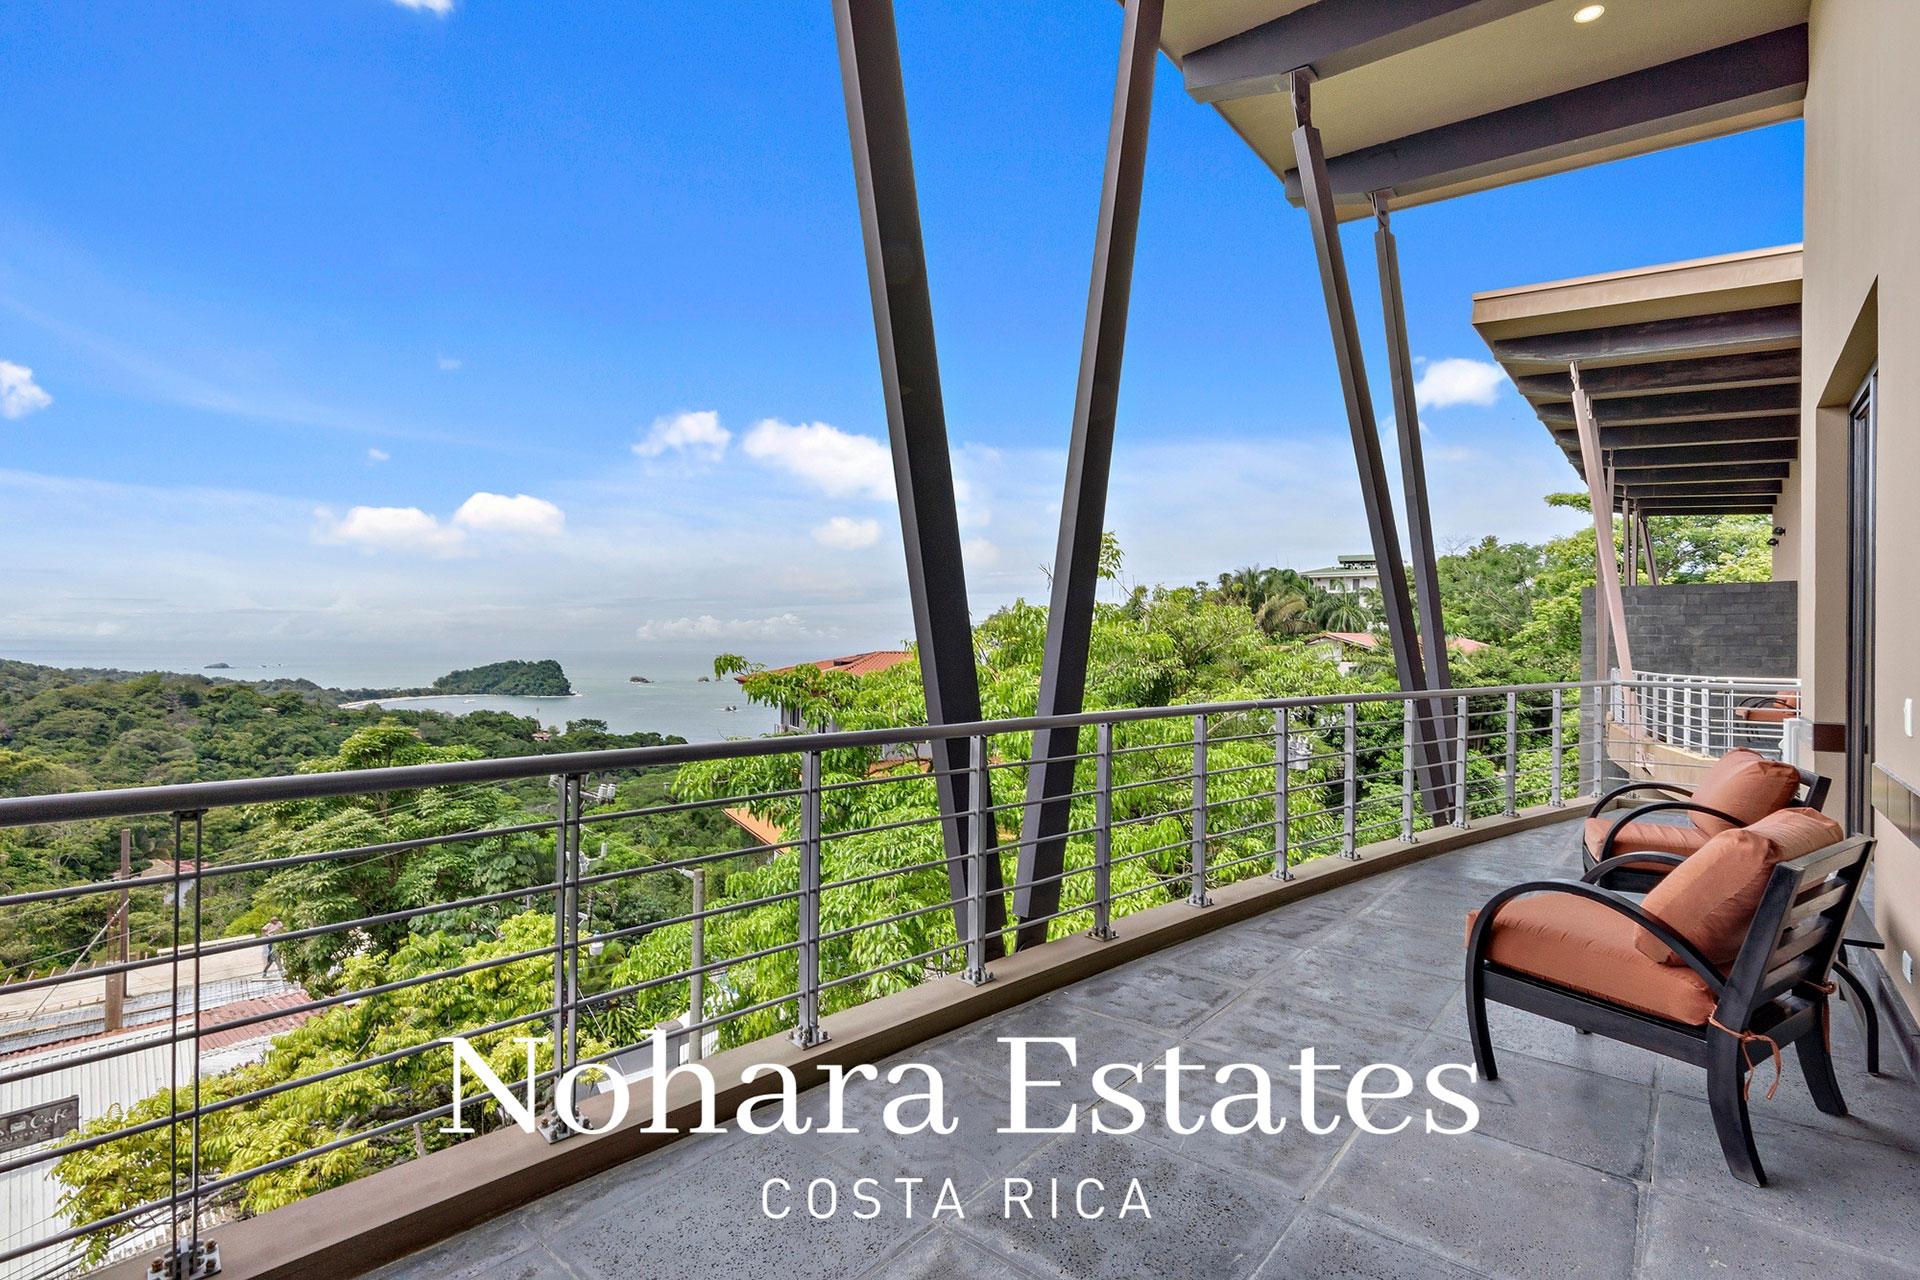 Nohara Estates Costa Rica 128 Penthouse Quepos Los Altos 5